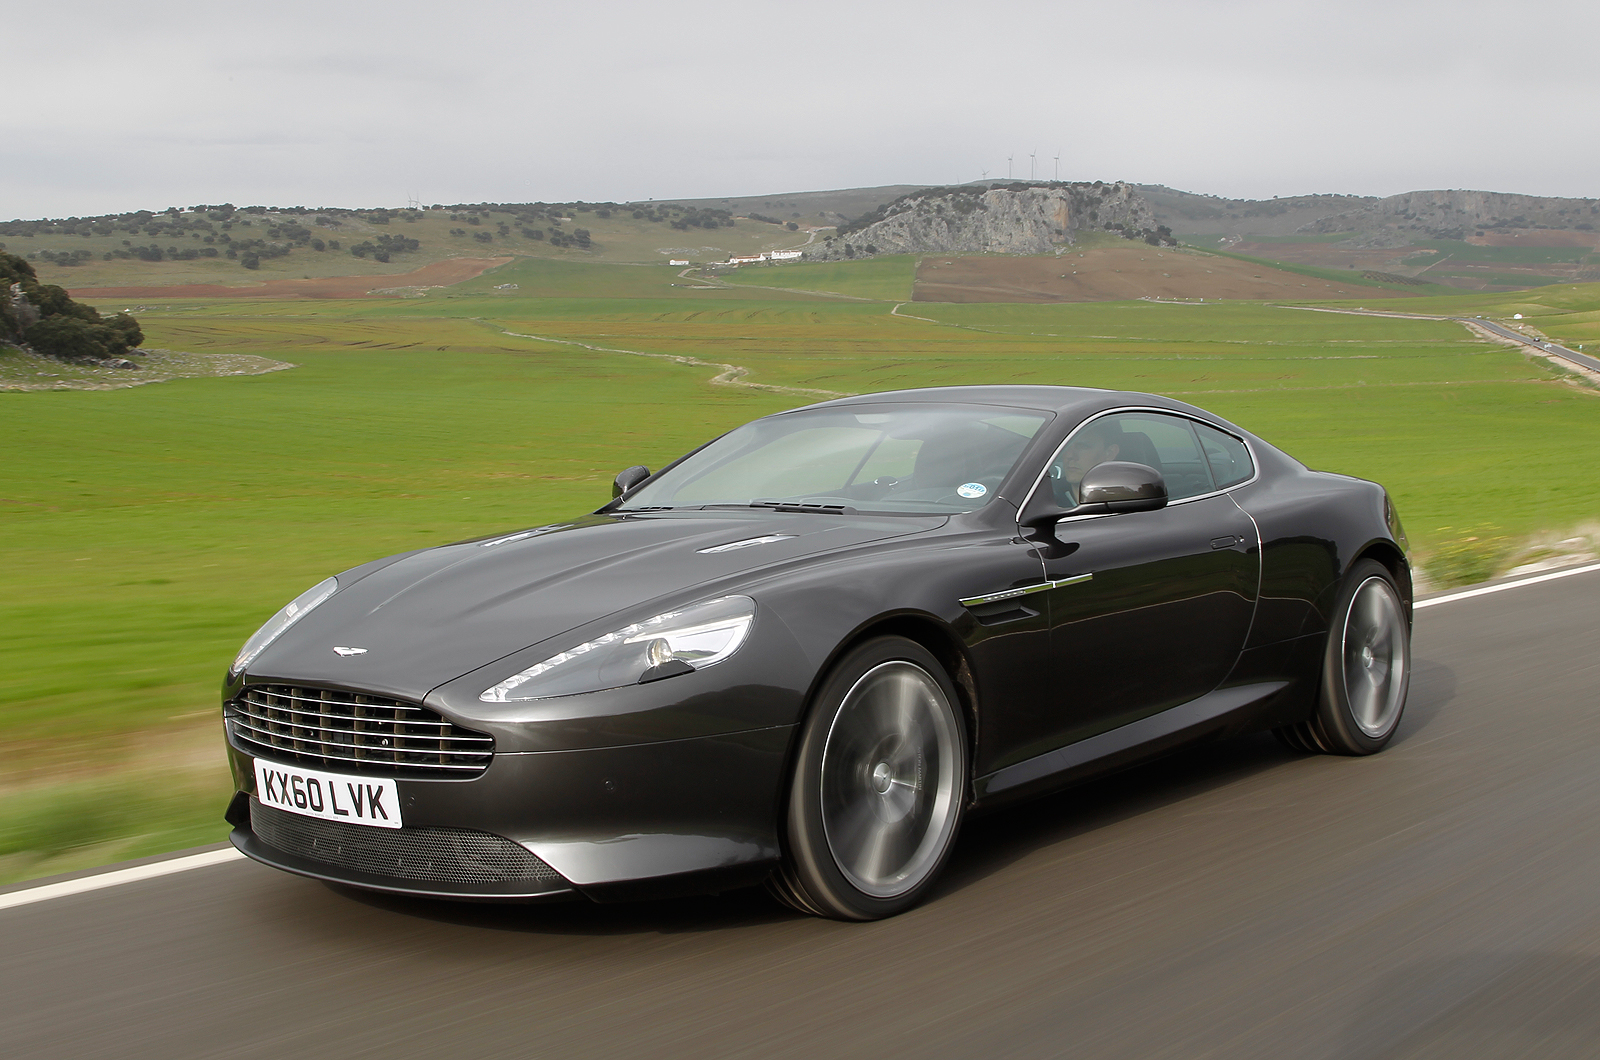 Aston Martin Virage 2011 2012 Review 2021 Autocar